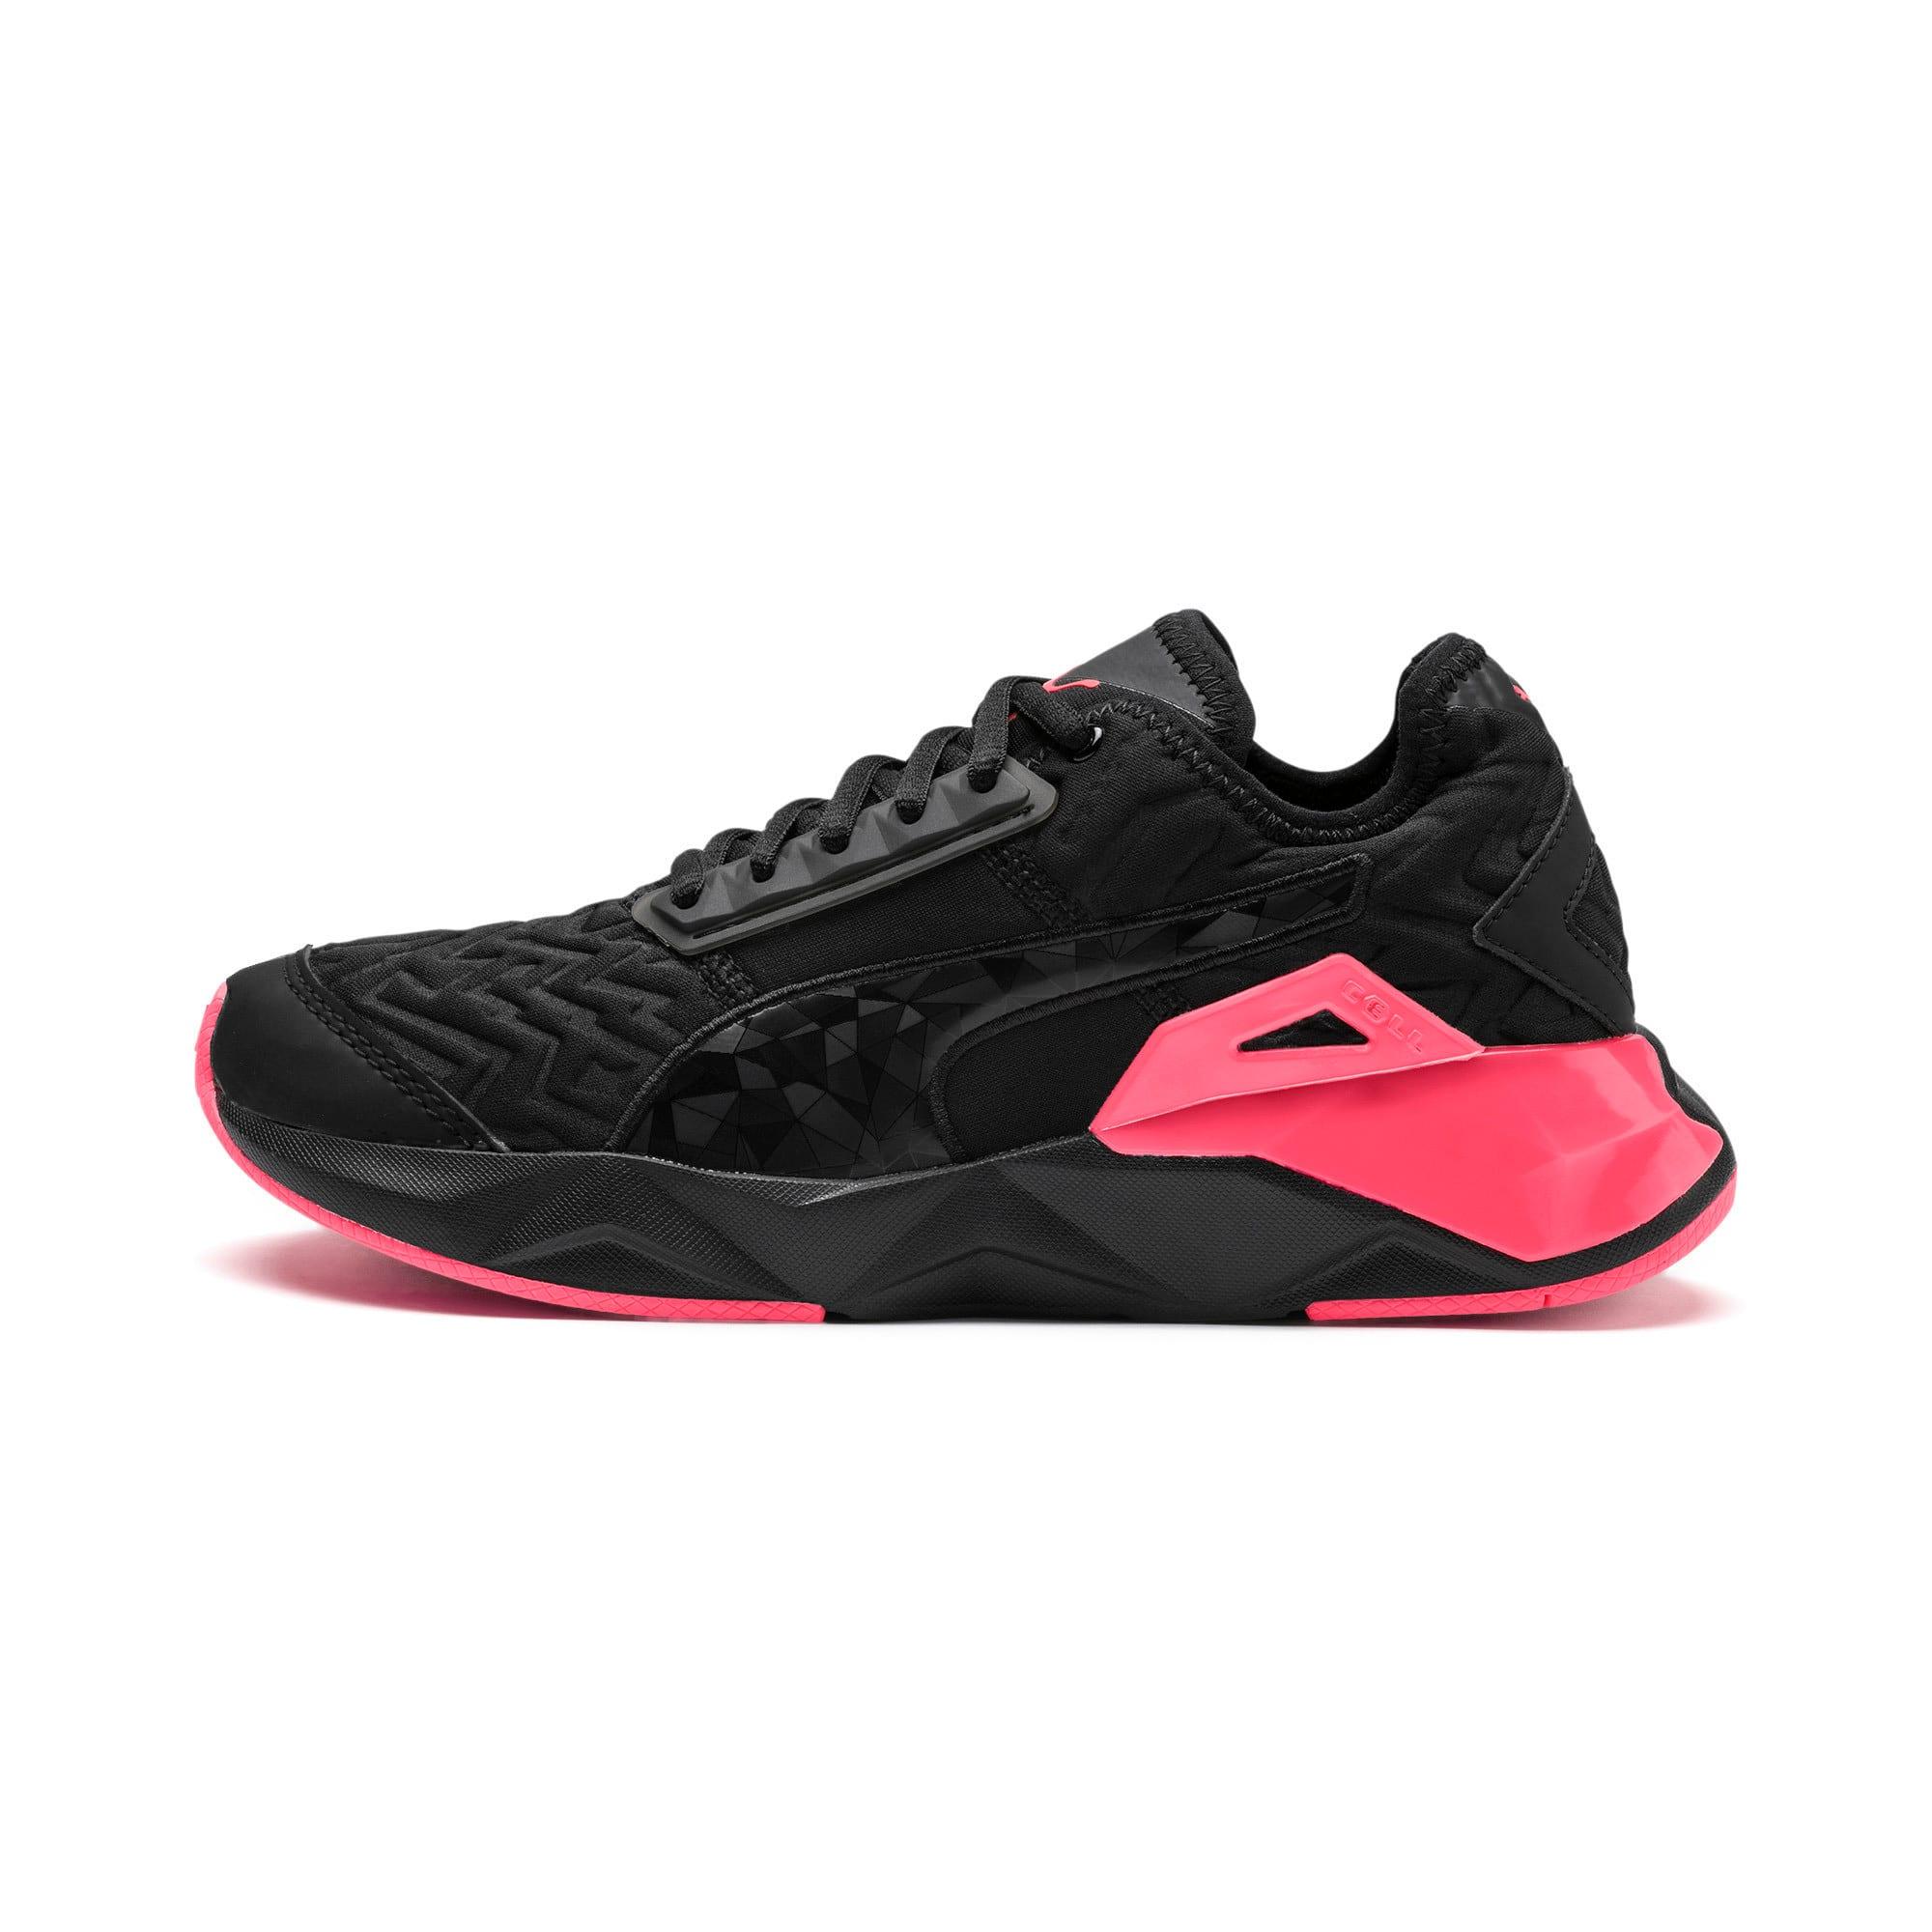 Thumbnail 1 of CELL Plasmic Fluorescent Women's Training Shoes, Puma Black-Pink Alert, medium